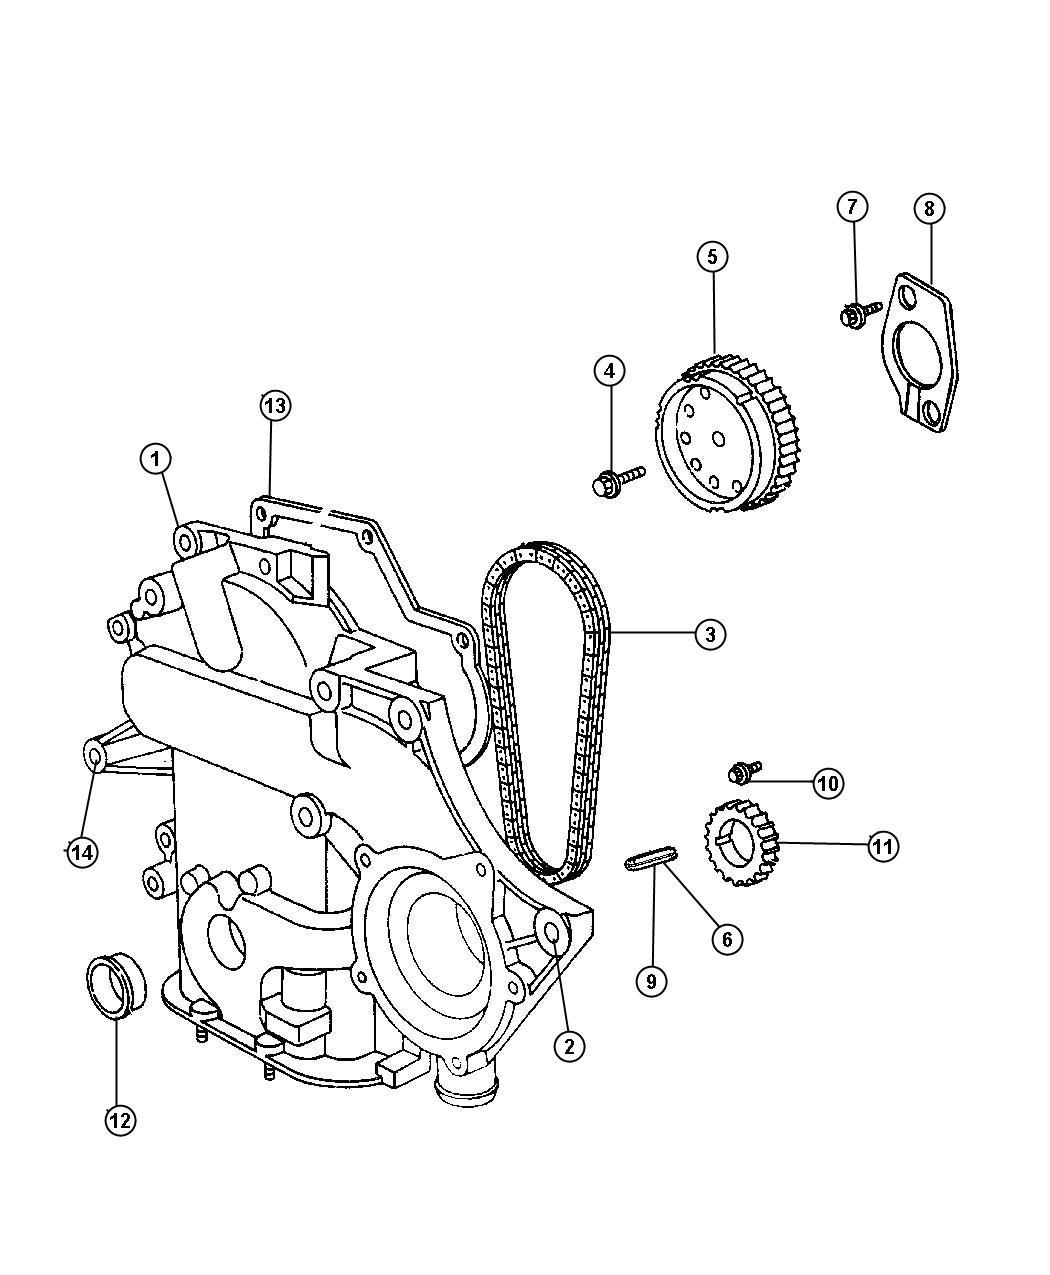 Service manual [2000 Dodge Caravan Timing Chain Pdf